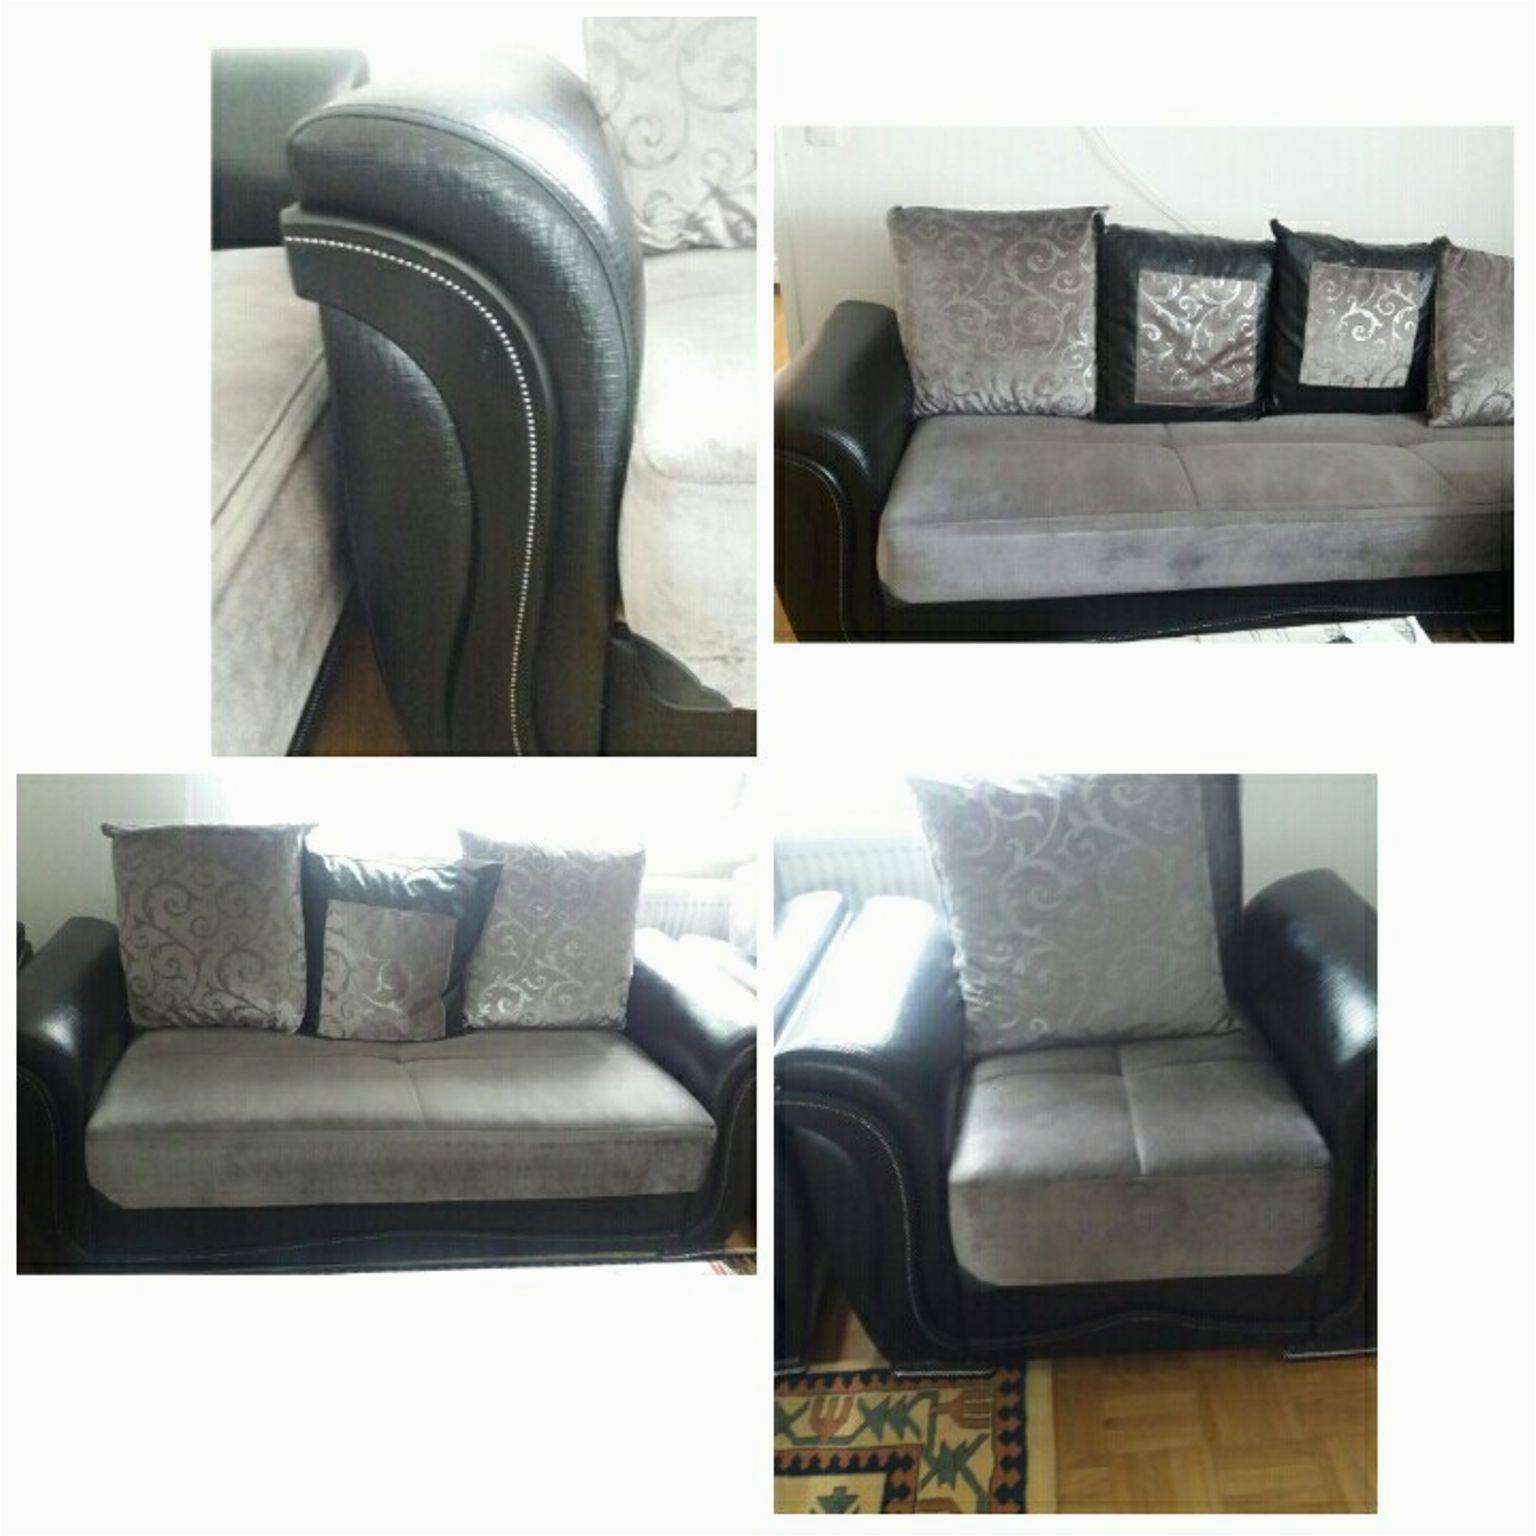 stuehle bei ikea ikea esszimmer sofa reizend luft sofa ikea luxus bmw x3 2 0d beste luxus